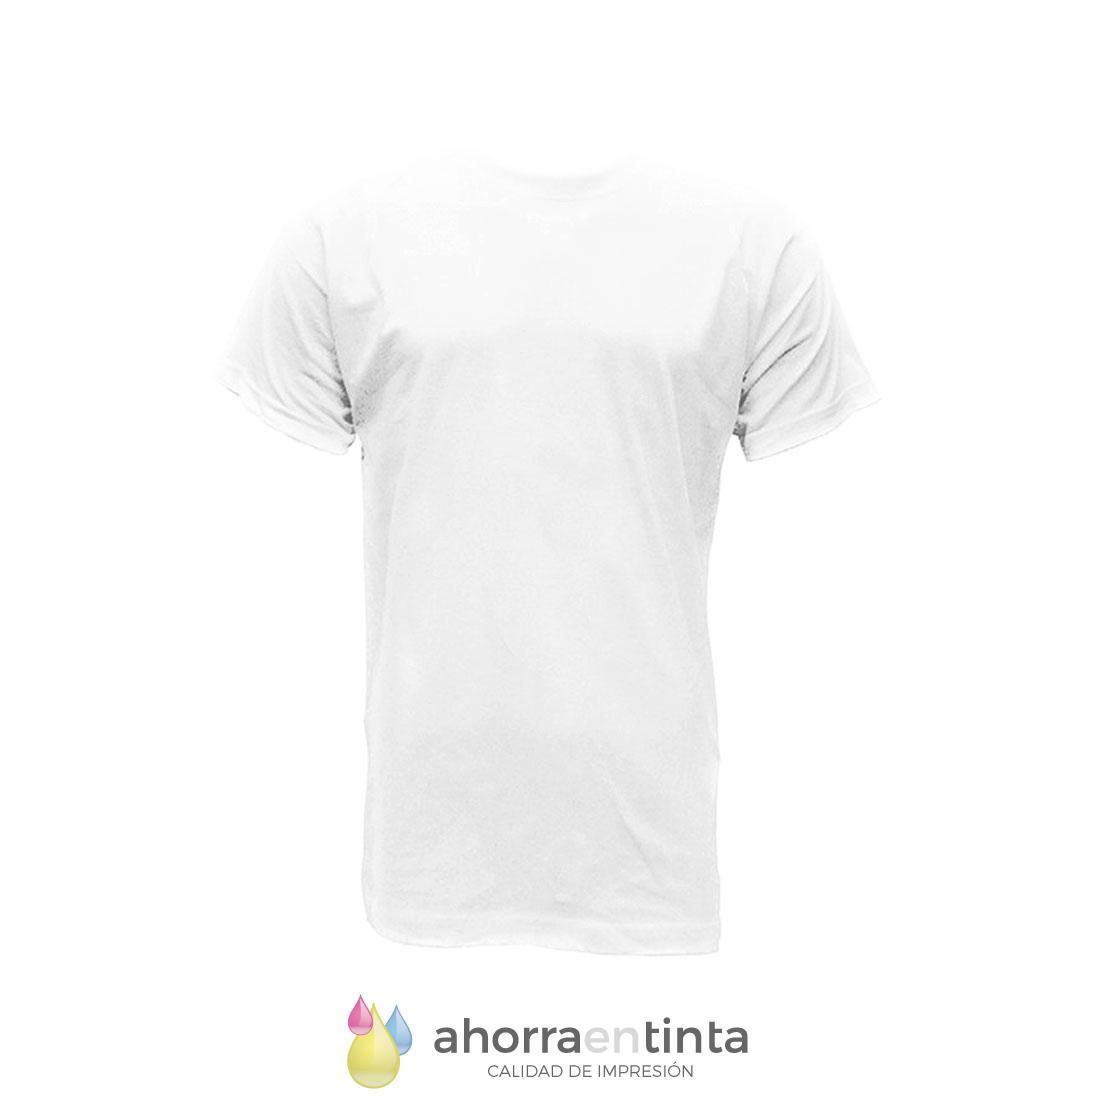 Camiseta Poliester Blanca 160gr -TACTO ALGODON- ANBOR Bonny HOMBRE. Tallas XS a XXL